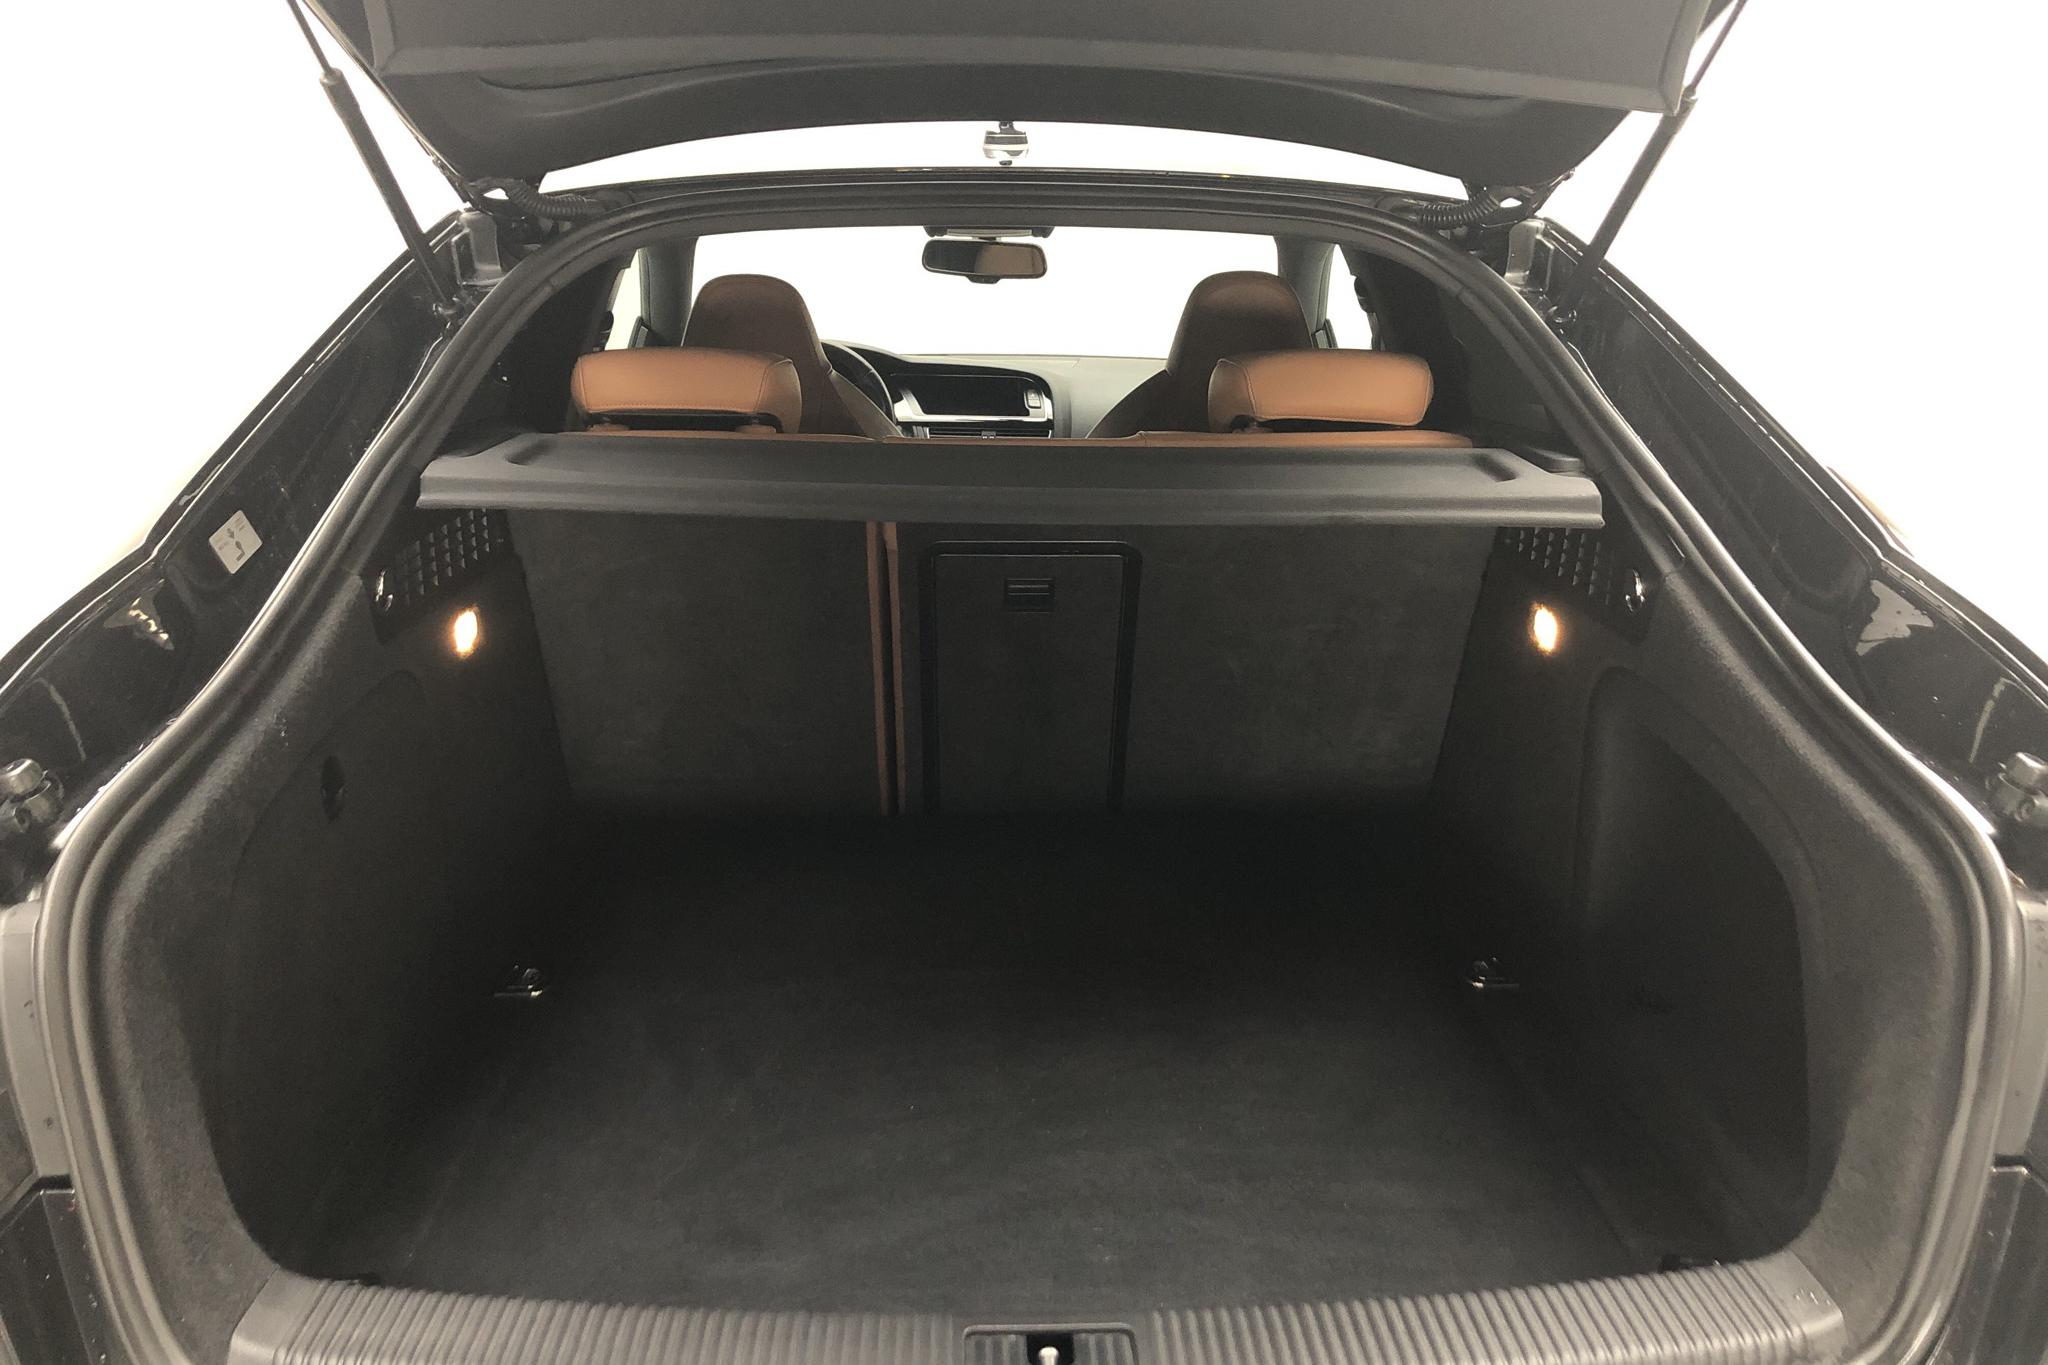 Audi S5 3.0 TFSI Sportback quattro (333hk) - 13 135 mil - Automat - svart - 2013